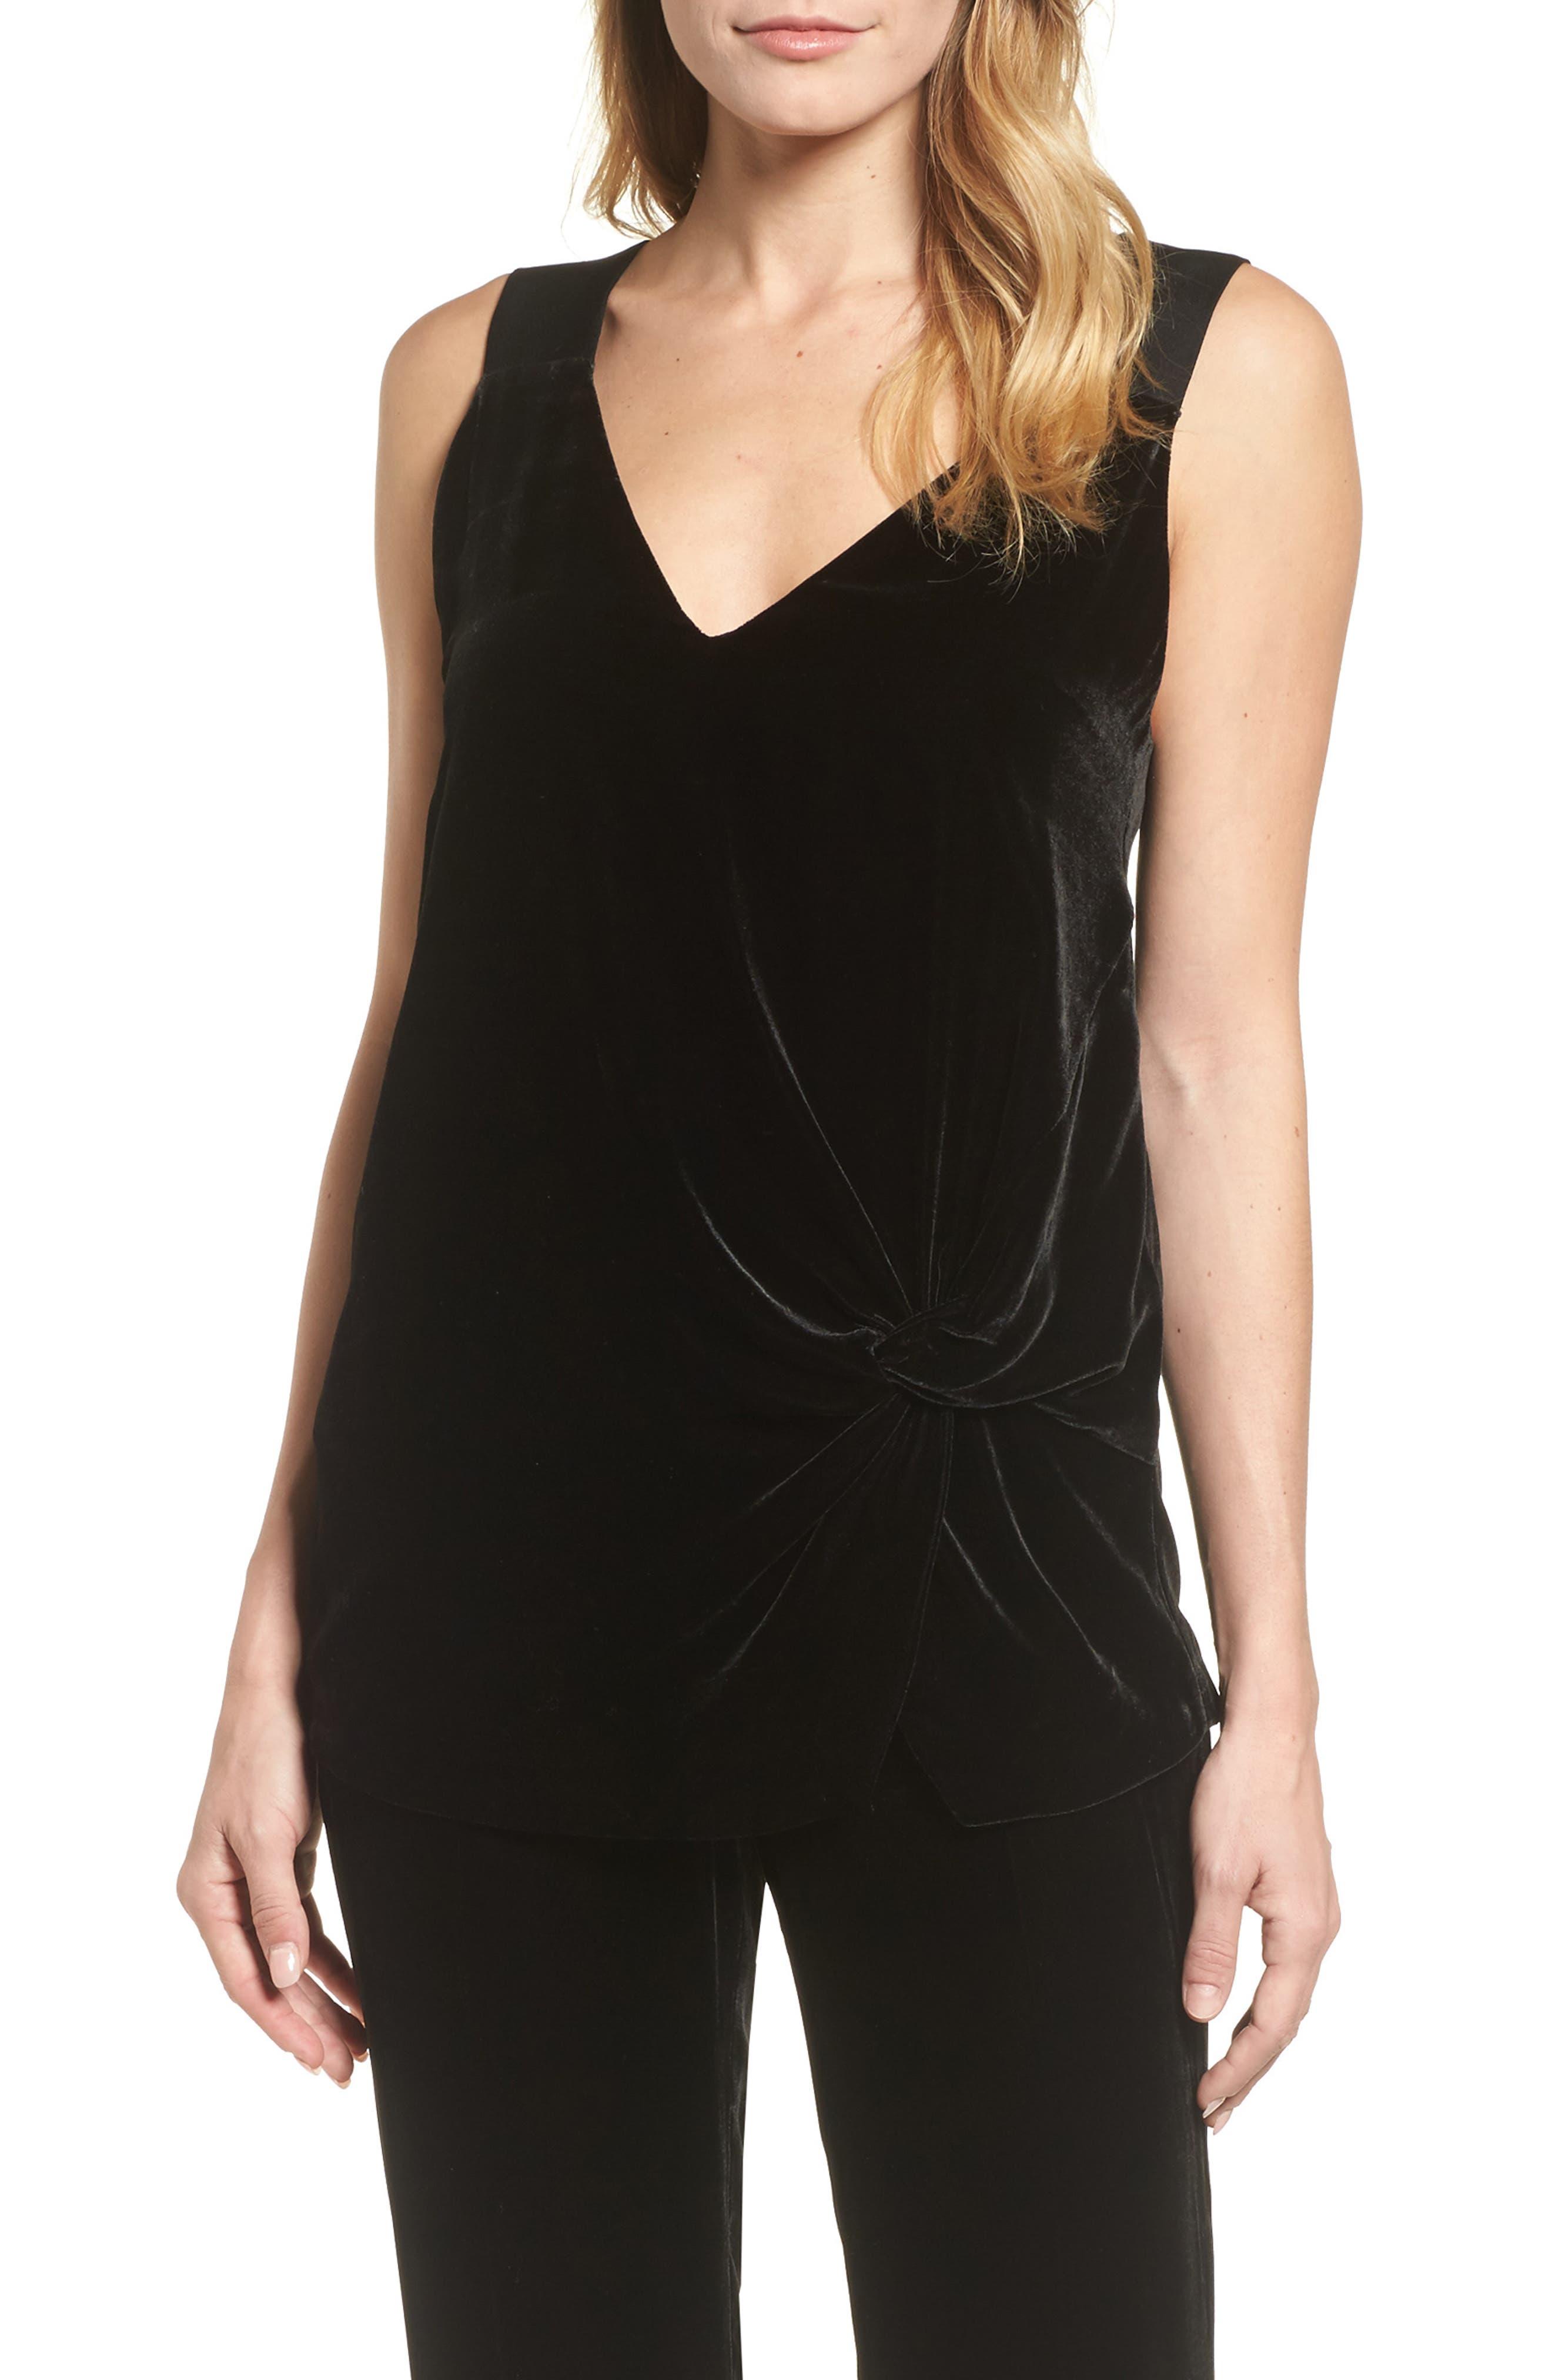 Ikaria Velvet Top,                         Main,                         color, Black